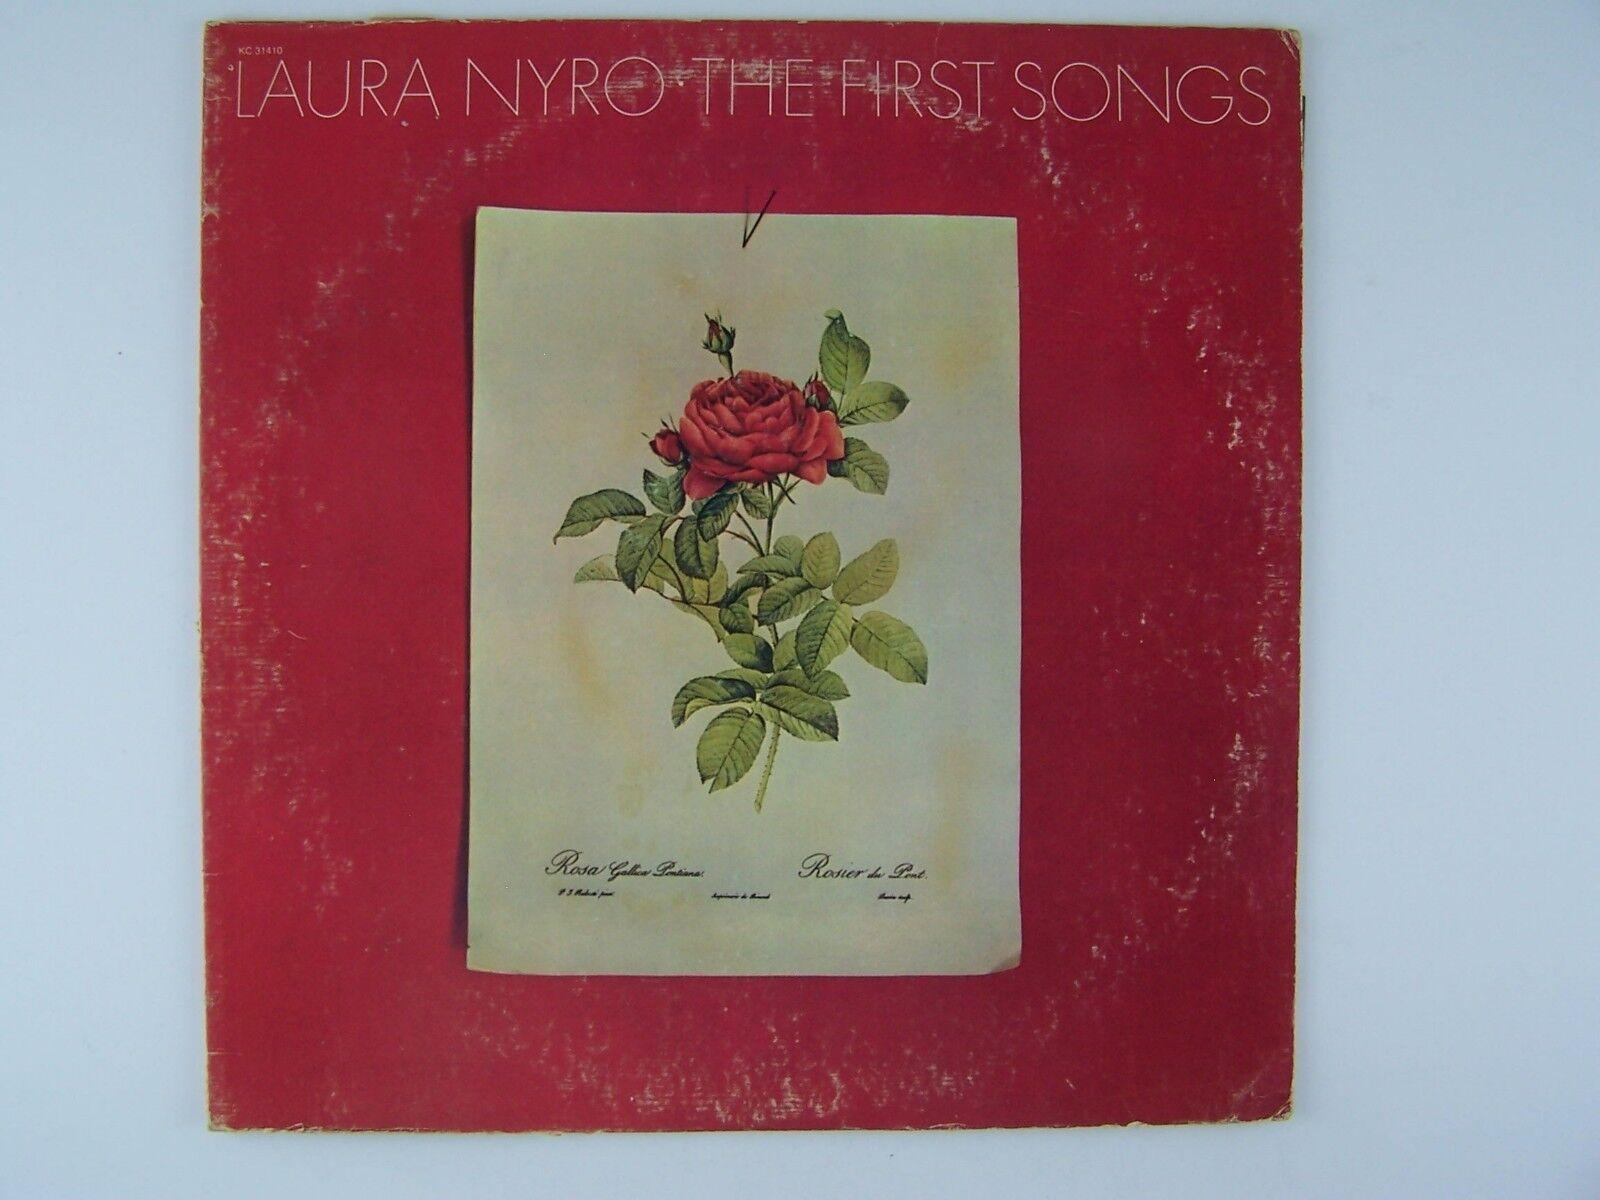 Laura Nyro - The First Songs Vinyl LP Record Album KC 3